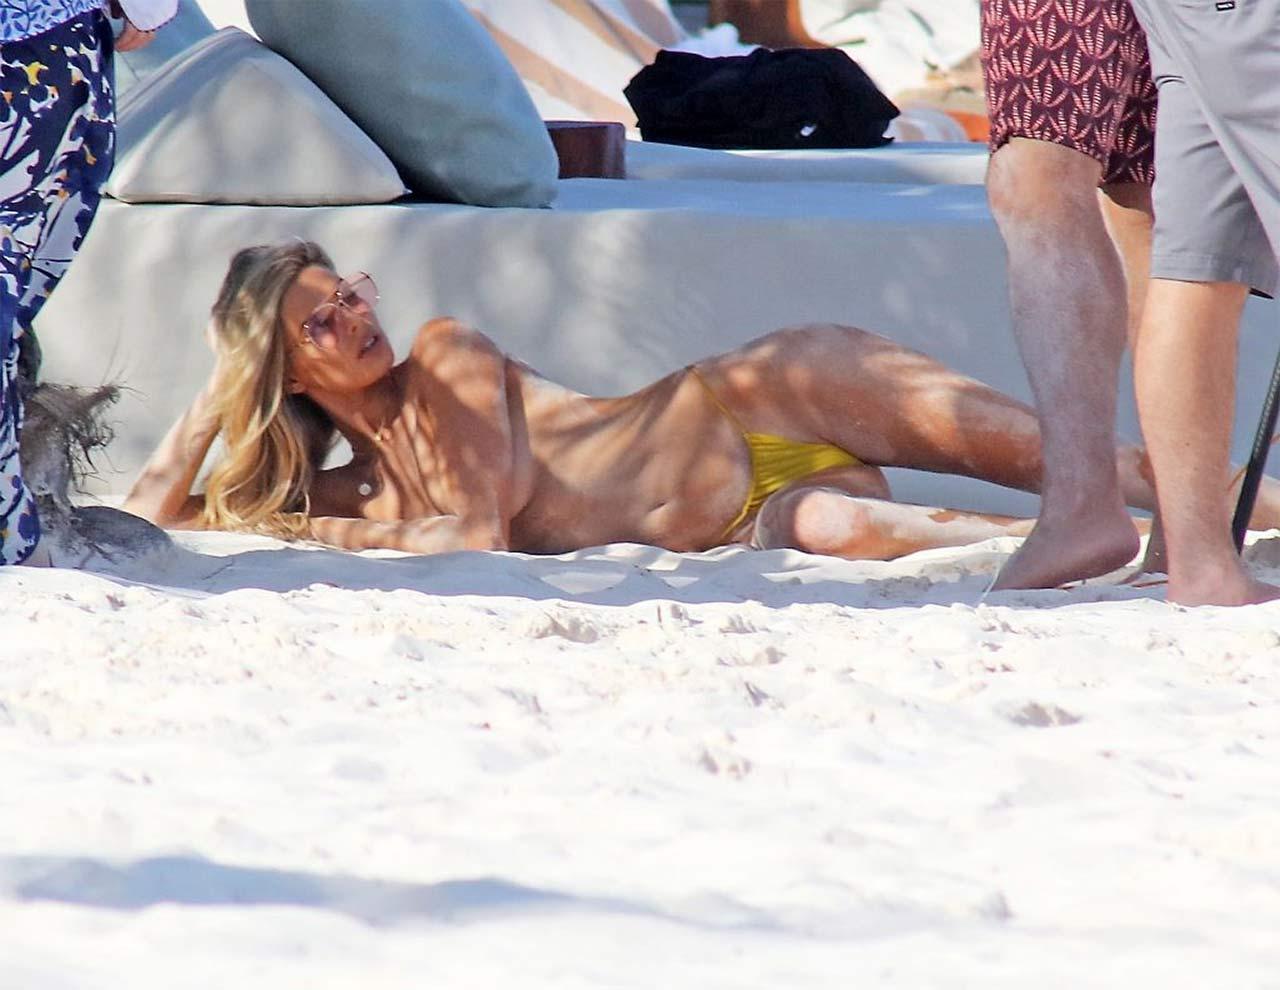 Sandy danielle knudson nude tits on the set milos raonics girlfriend is sexy - 2019 year